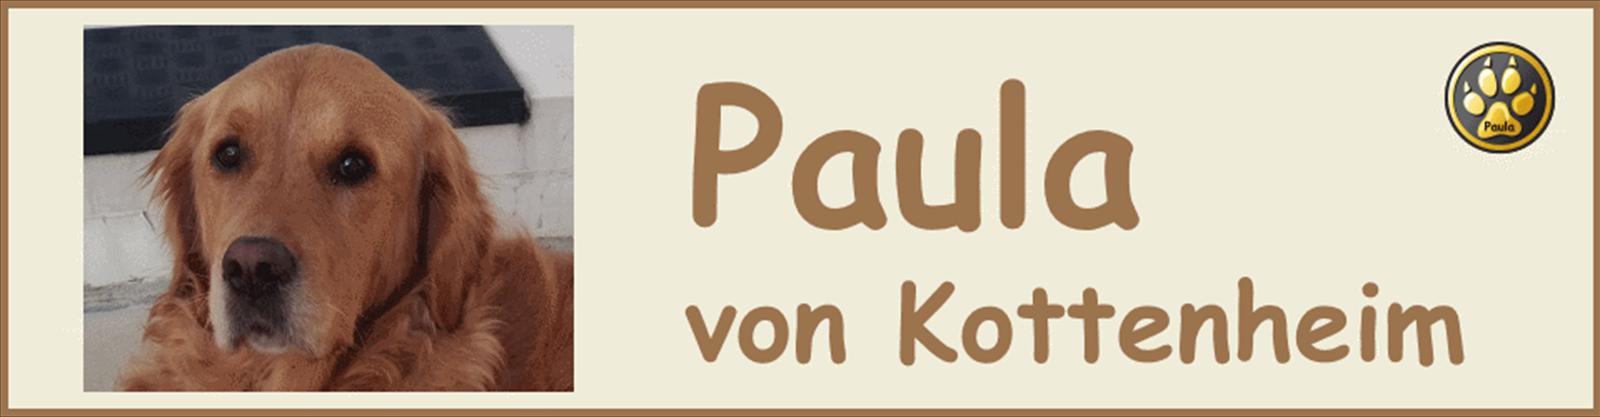 Paula-Banner-11